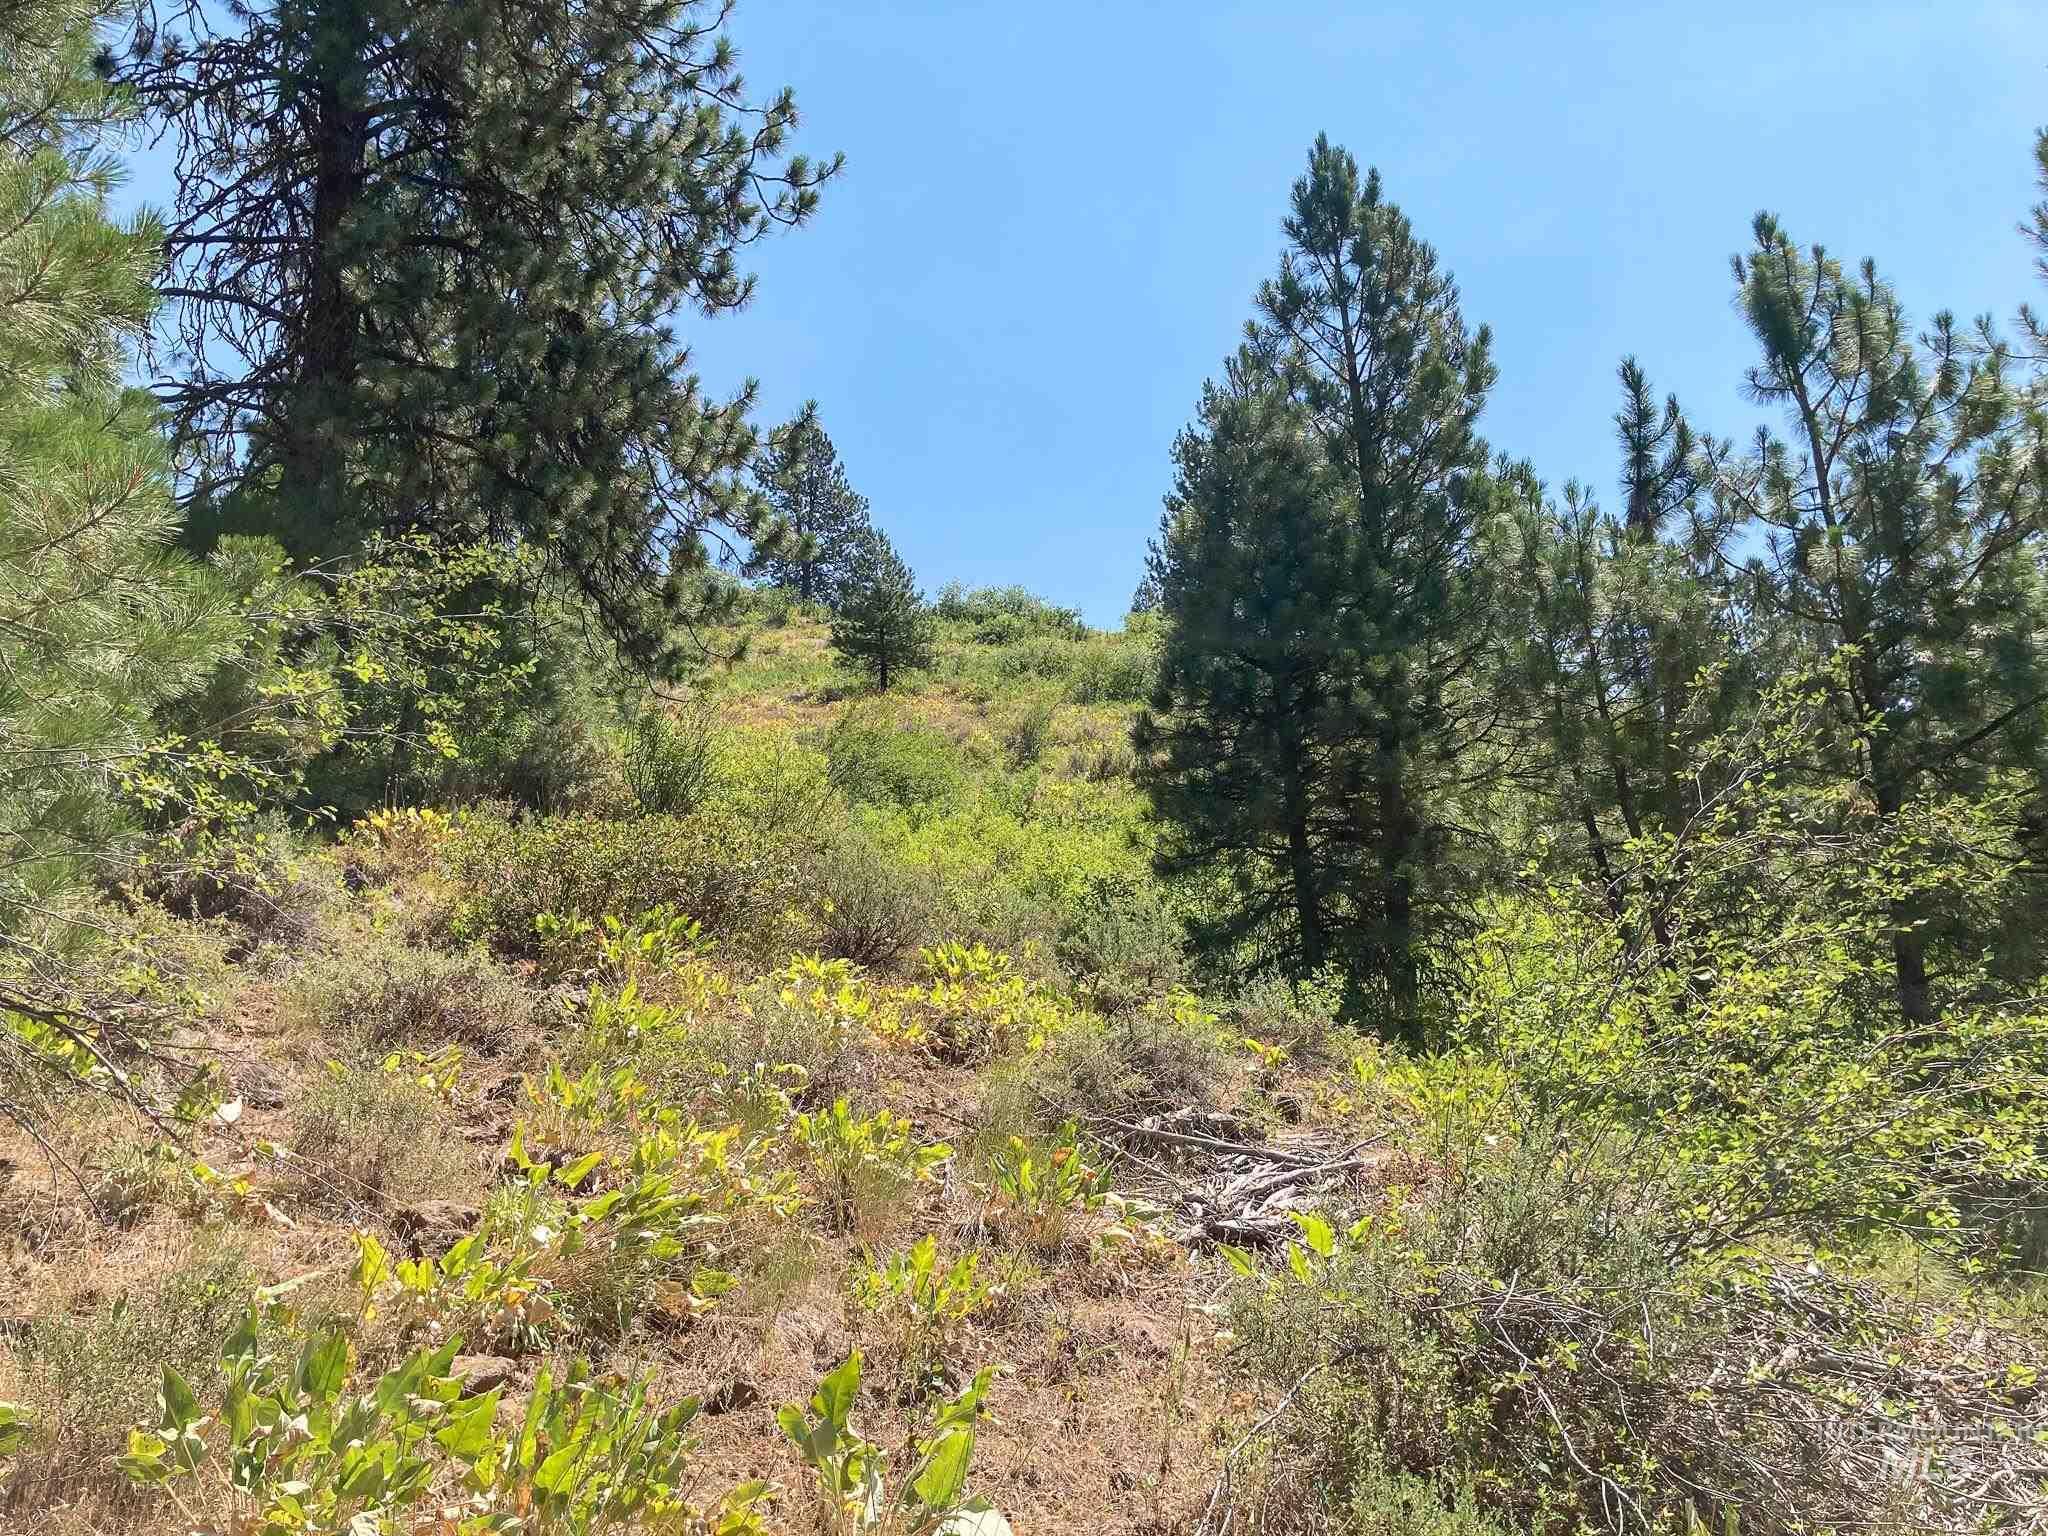 Tbd Fruitvale Glendale Road Property Photo 24